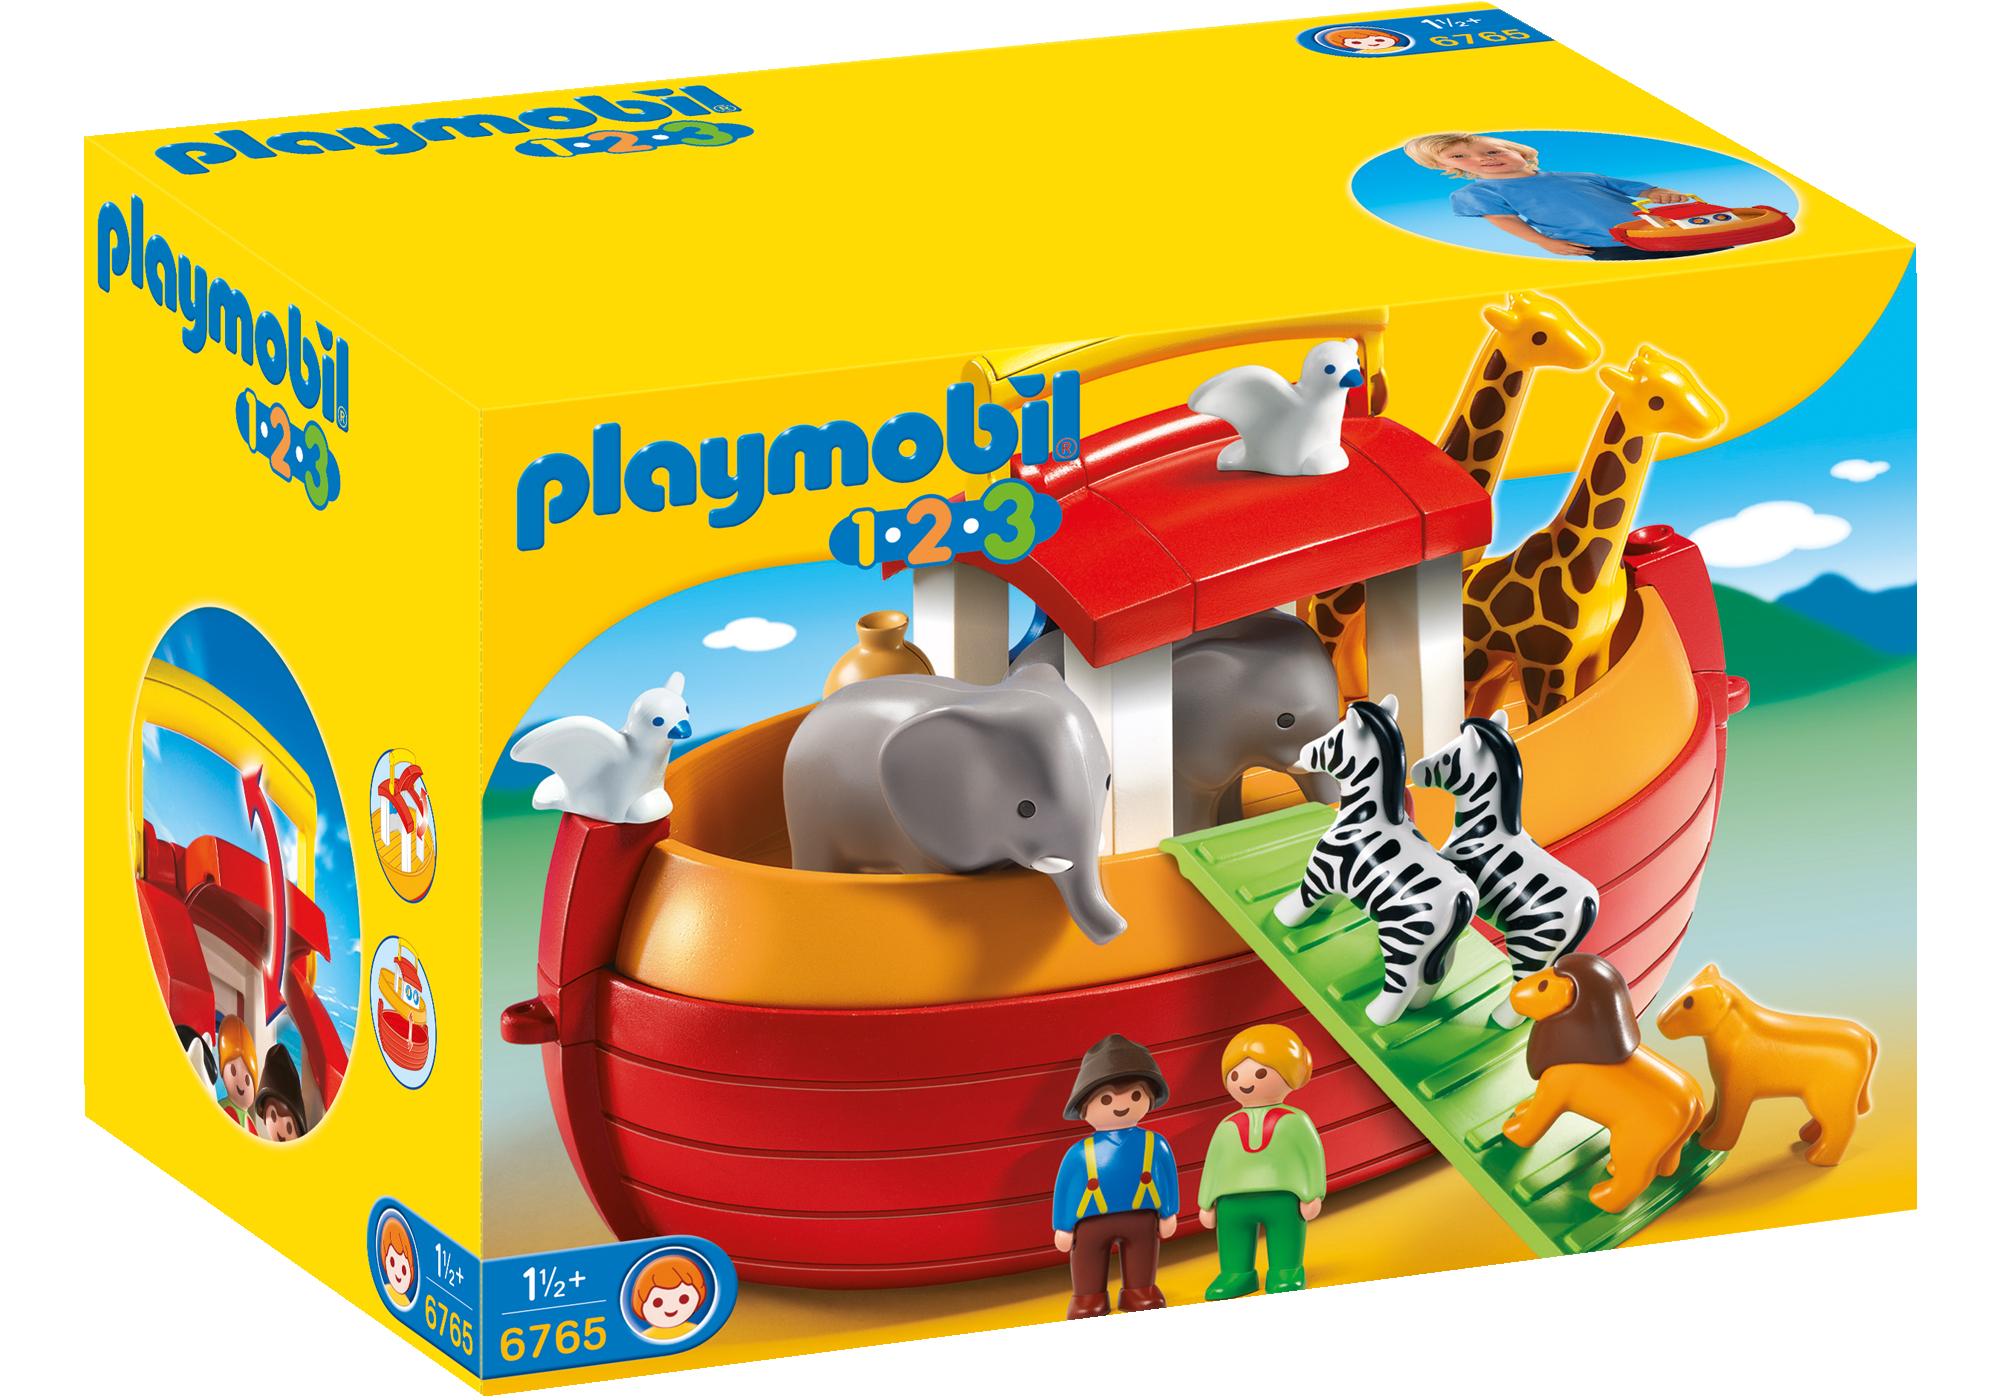 http://media.playmobil.com/i/playmobil/6765_product_box_front/Meine Mitnehm-Arche Noah